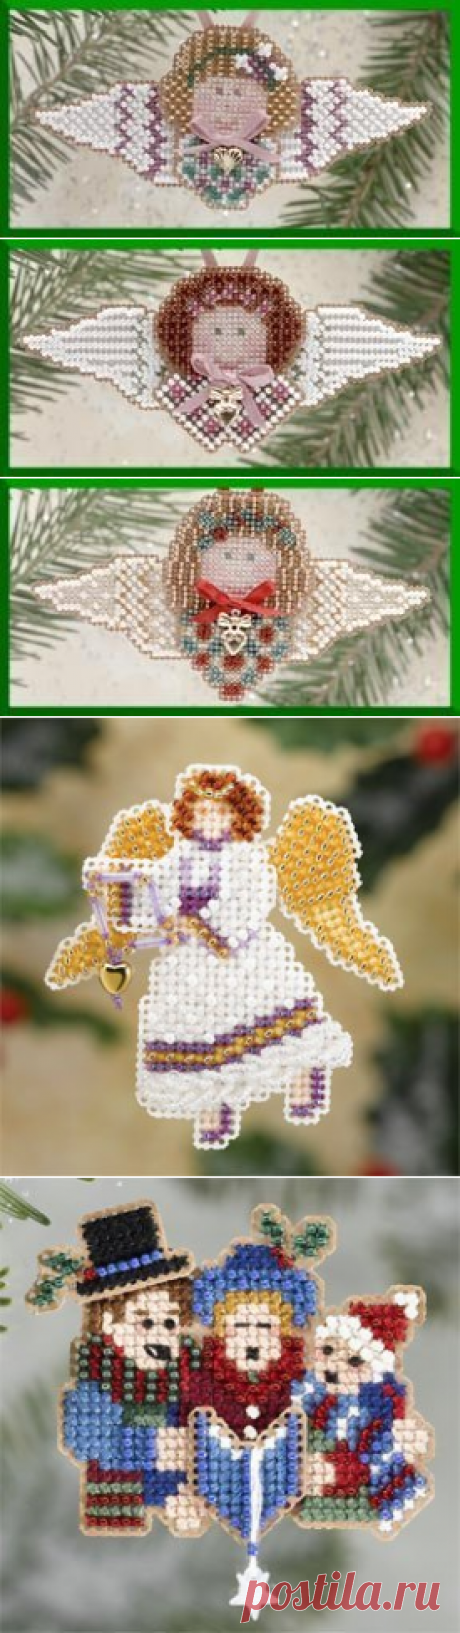 Mill Hill Christmas Angel 2004 - Beaded Cross Stitch Kit - 123Stitch.com